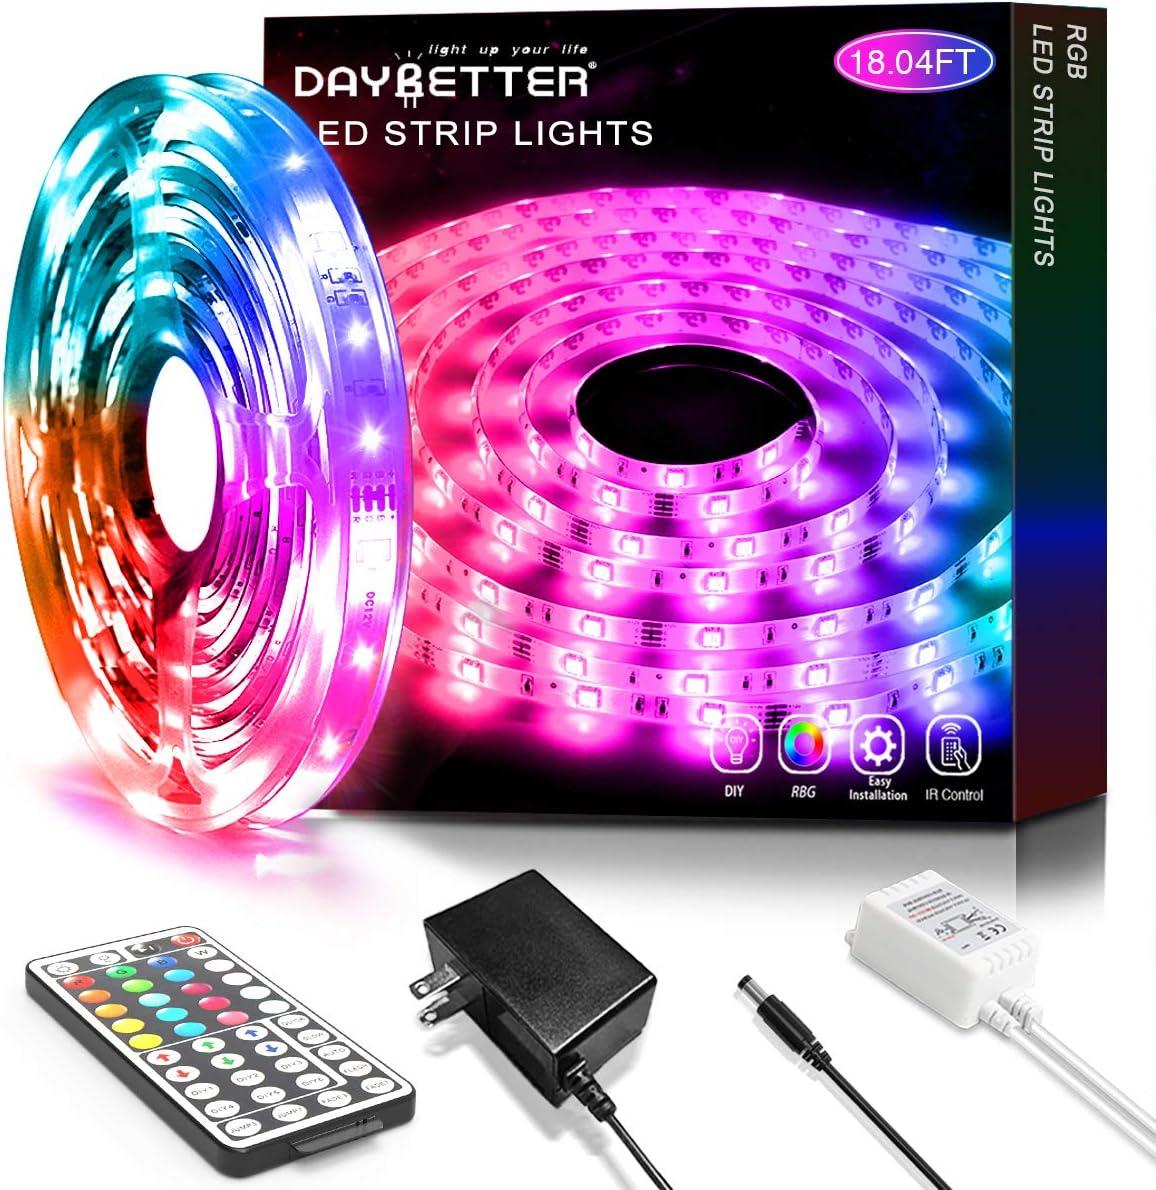 18.04ft Led Strip Lights 5.5m with 44 Keys IR Remote and 12V Power Supply Flexible Color Changing 5050 RGB Led Lights Strip Kit for Home, Bedroom, Kitchen,DIY Decoration